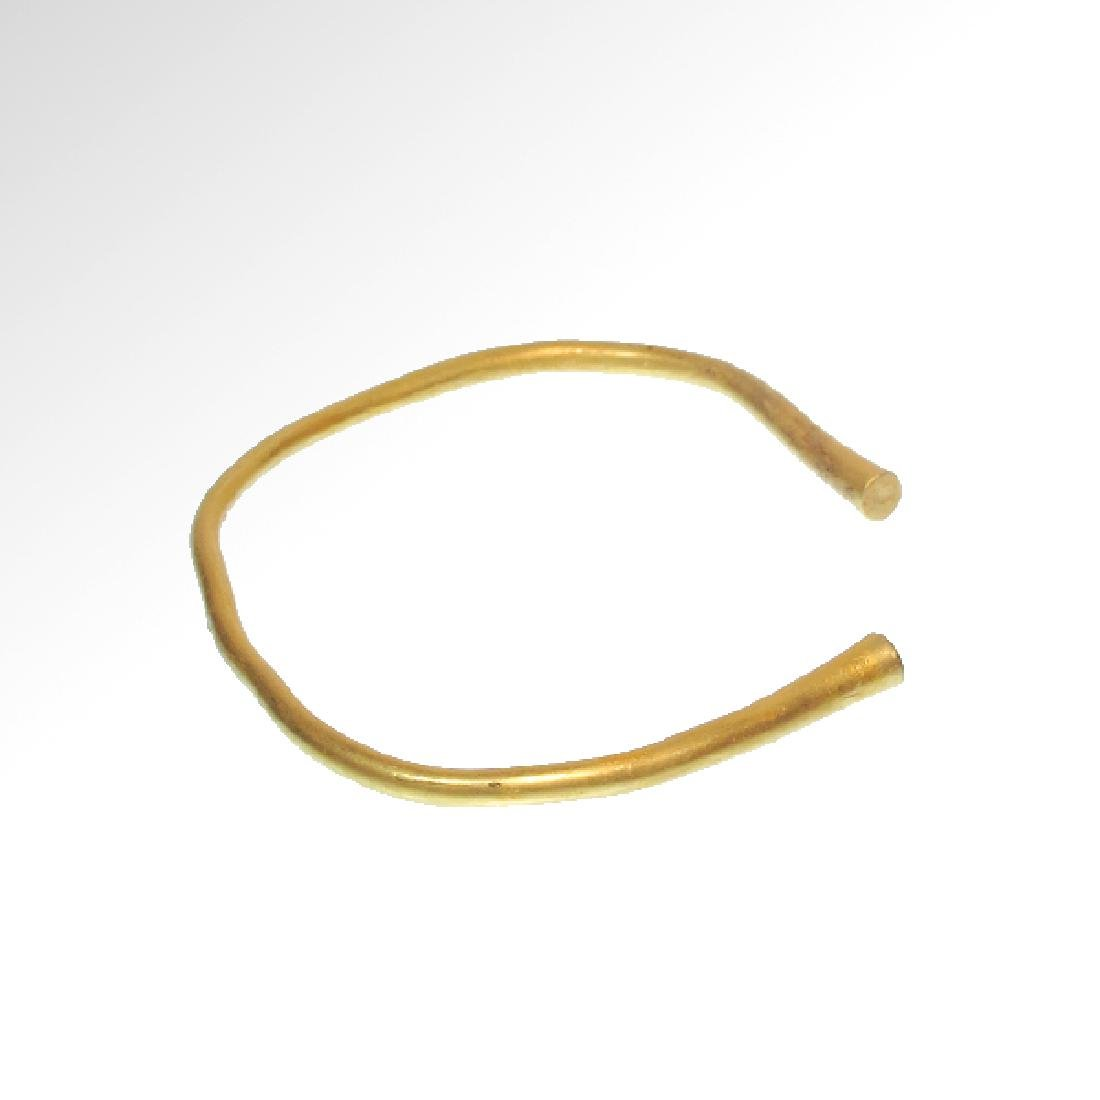 Greek Gold Bracelet, 5th-3rd Century B.C. - 5